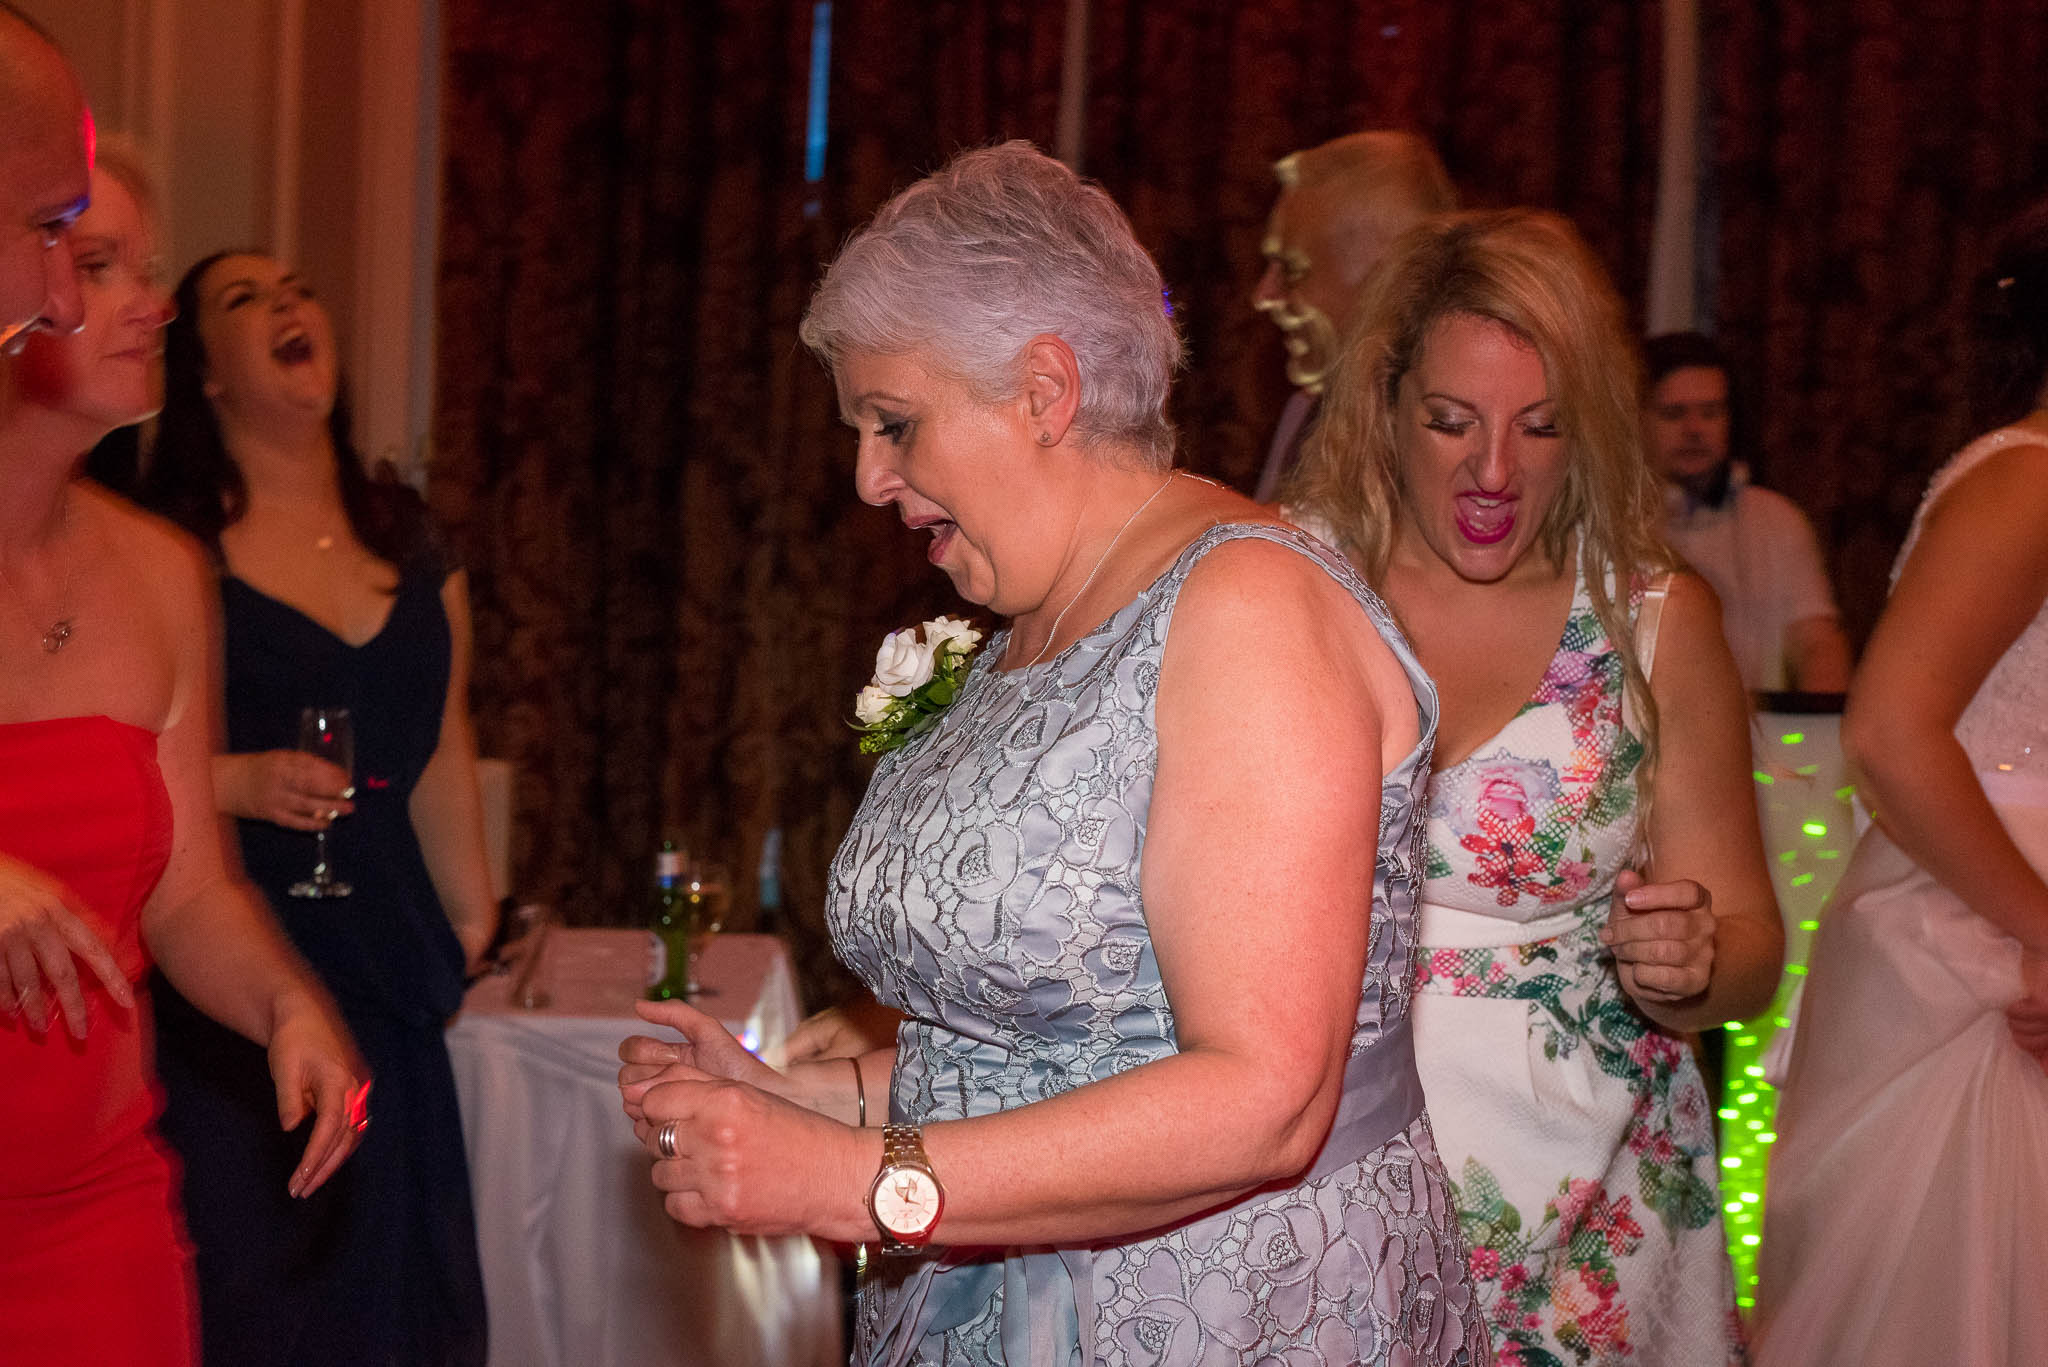 Crathorne Hall Hotel Wedding Photographer92.jpg